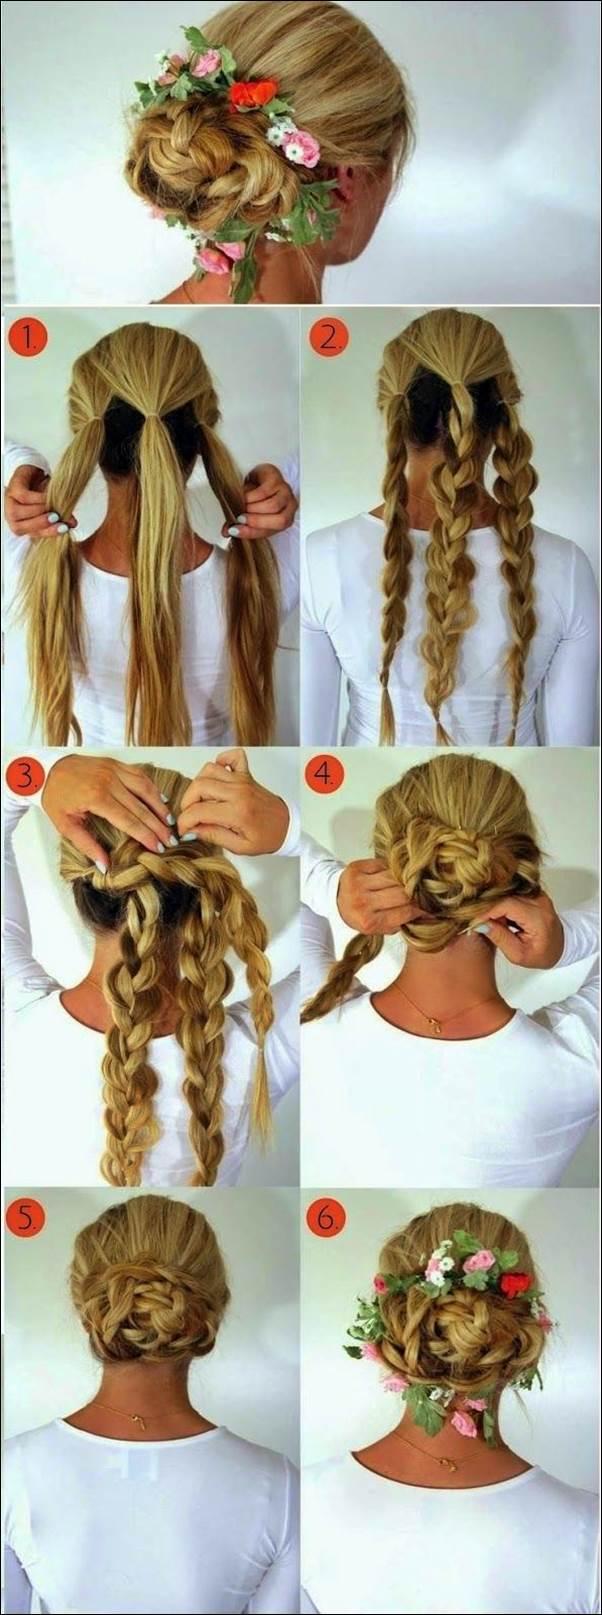 pundja-ljeto-kosa-frizura